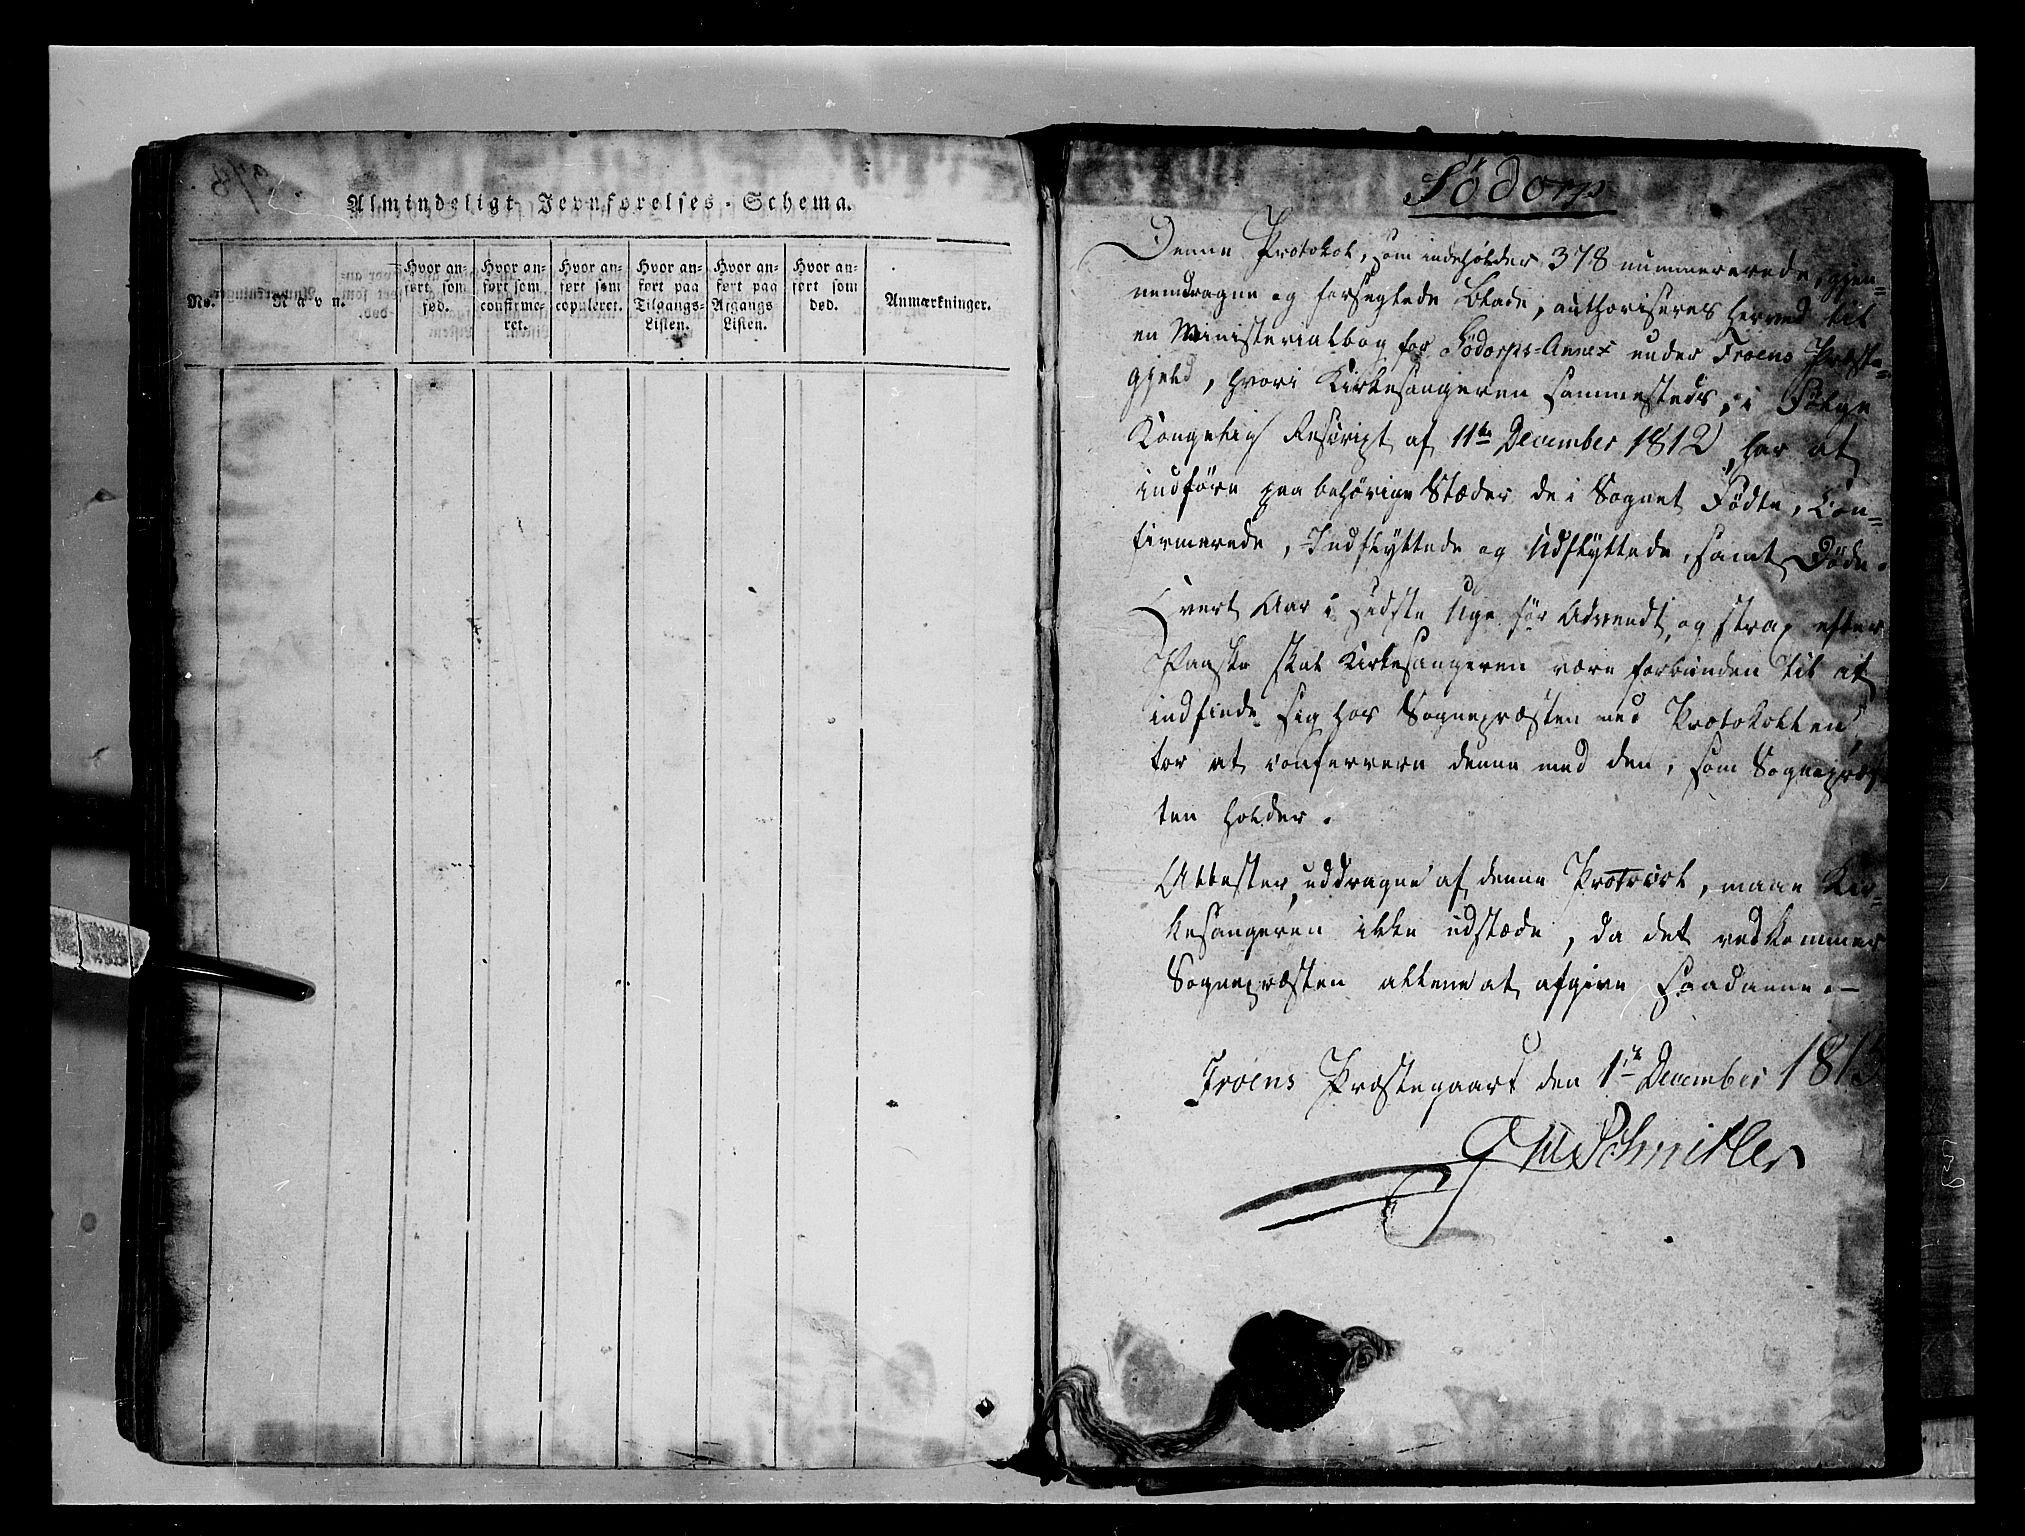 SAH, Fron prestekontor, H/Ha/Hab/L0004: Klokkerbok nr. 4, 1816-1850